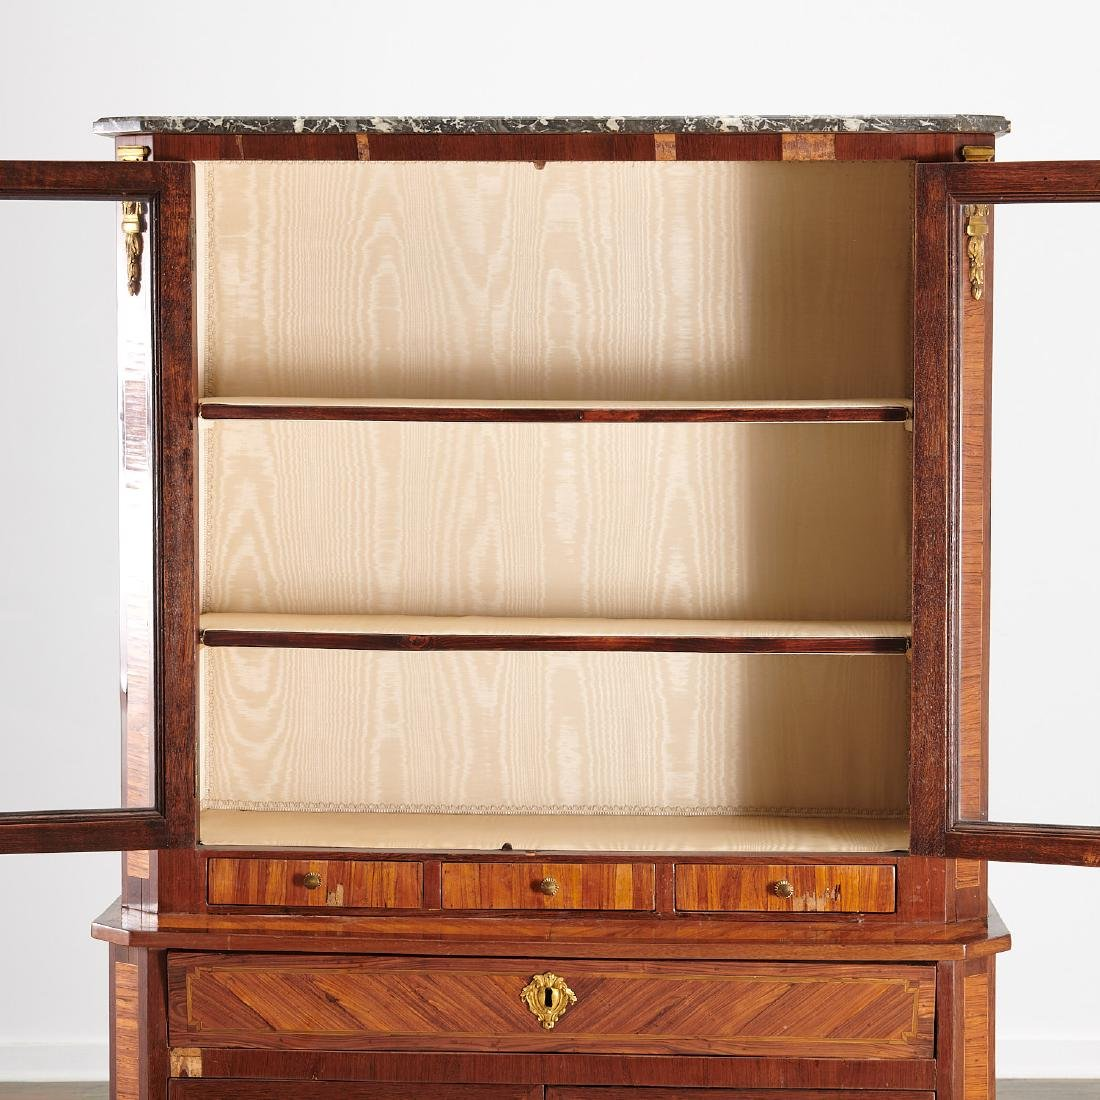 Louis XVI library secretaire bookcase - 6